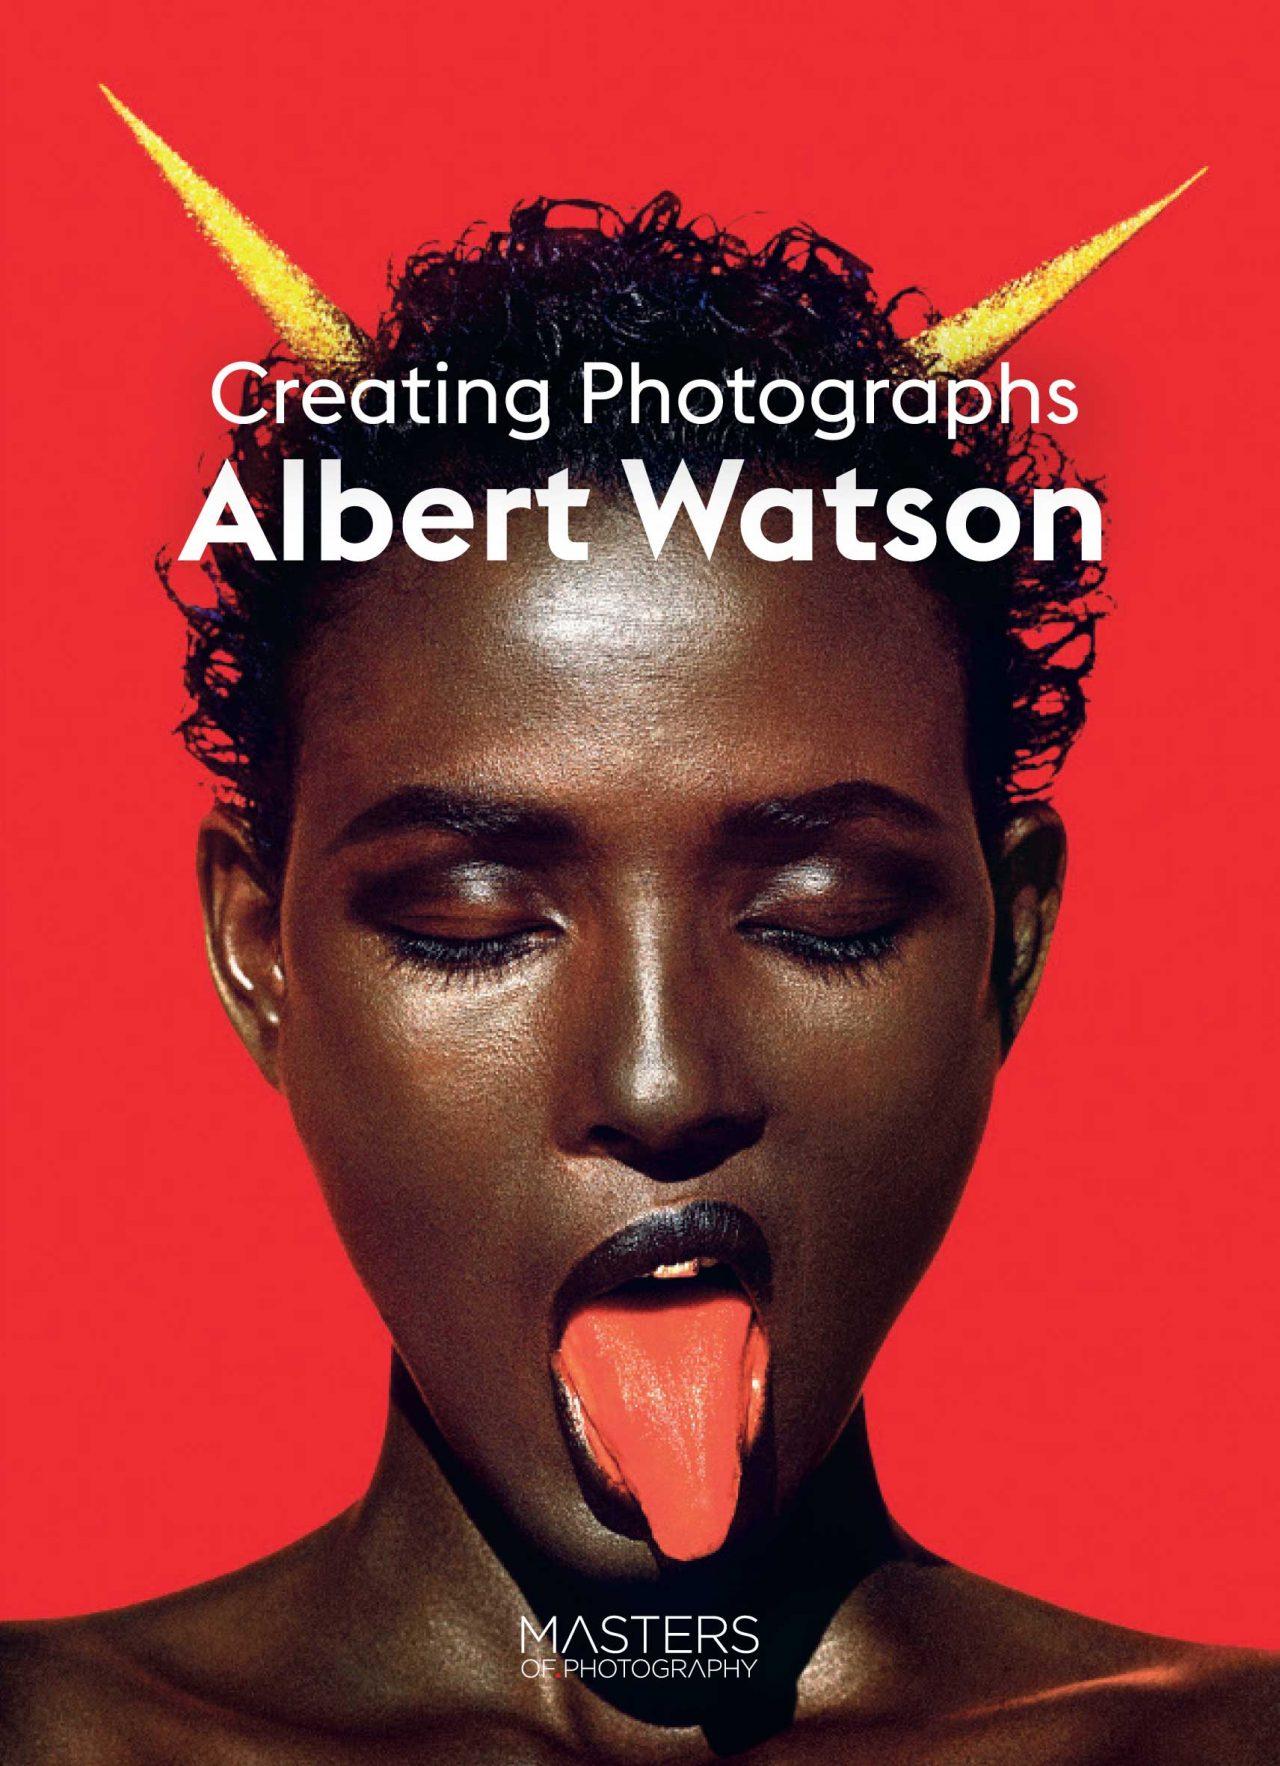 Albert Watson Creating Photographs